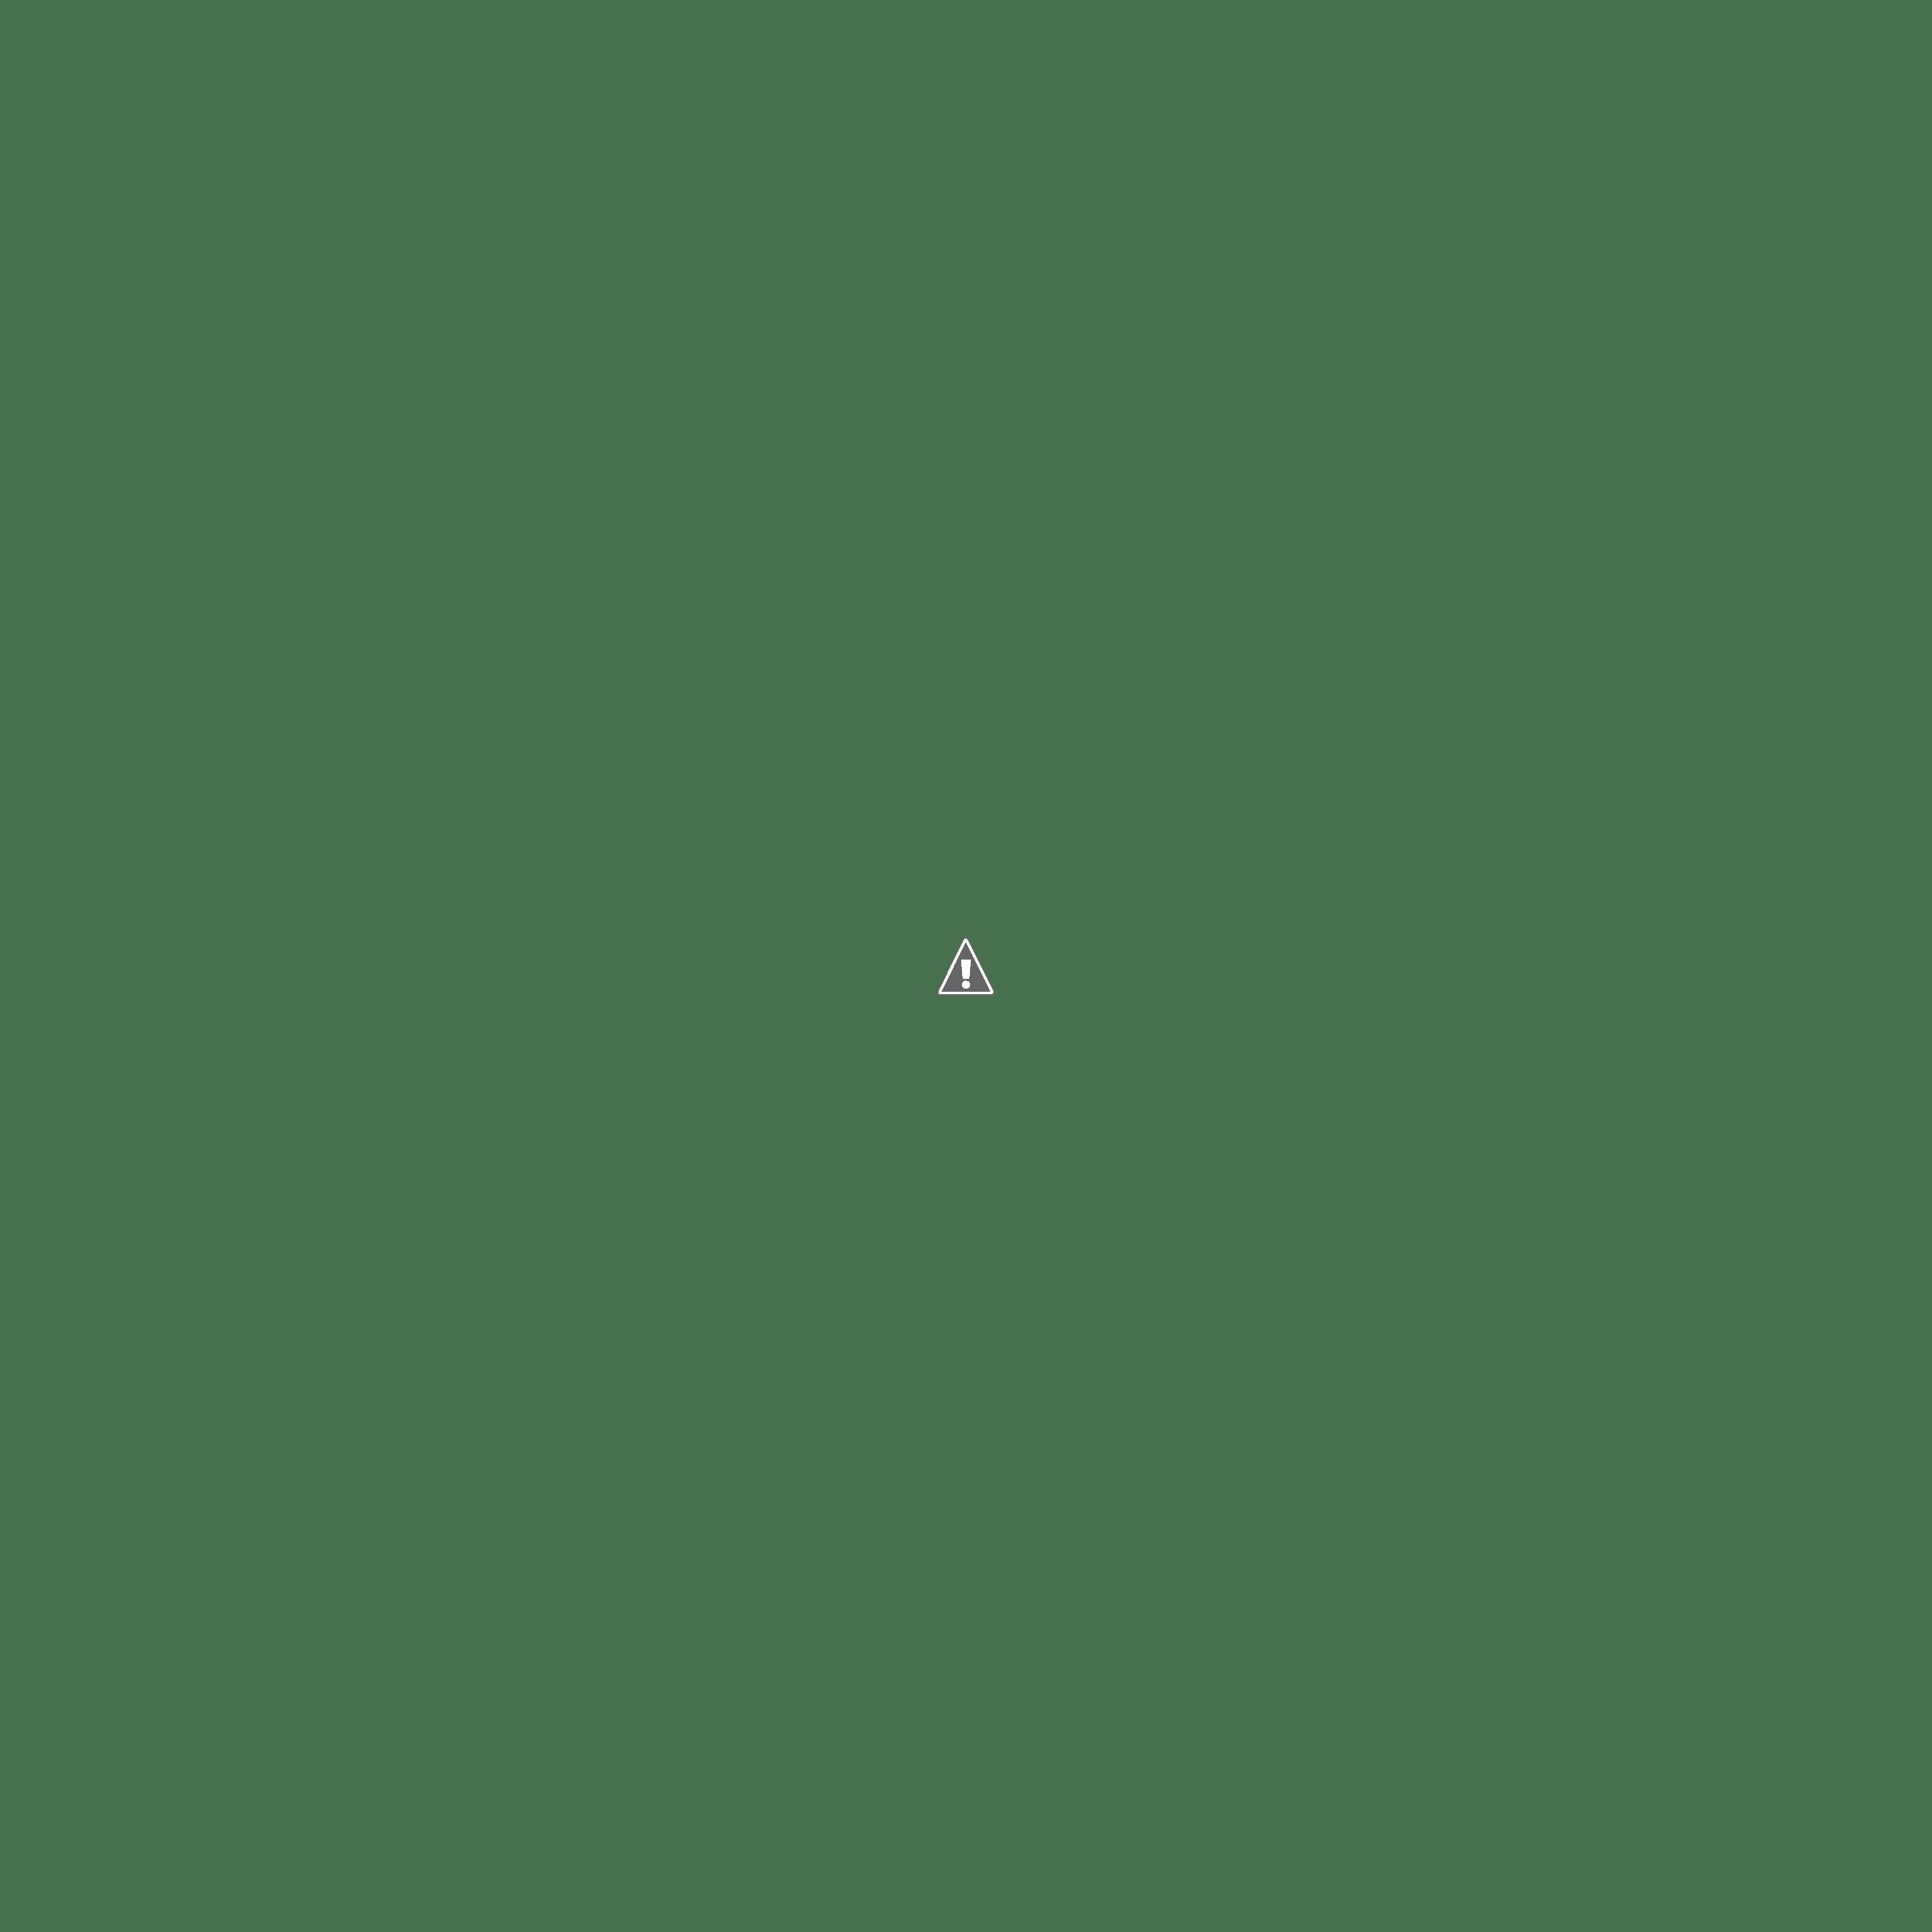 Infina Towers, Aurora Boulevard, QC 3 Bedroom resale with parking unit plan